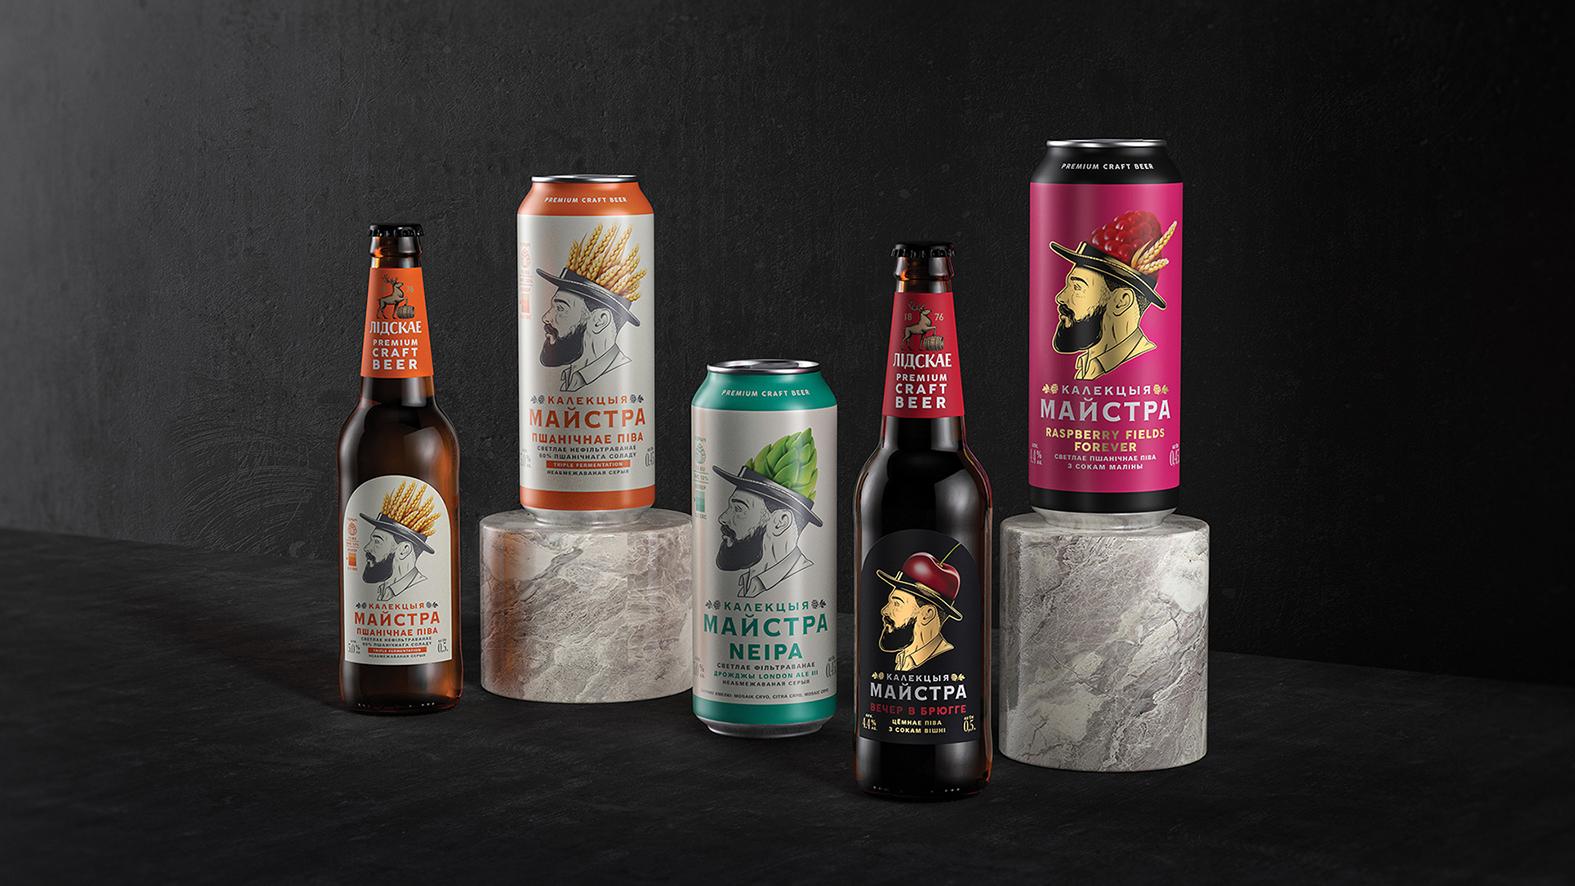 The BlackMoon Studio Create Packaging Design for Belarus's Legendary Brewery Lidskoe Pivo